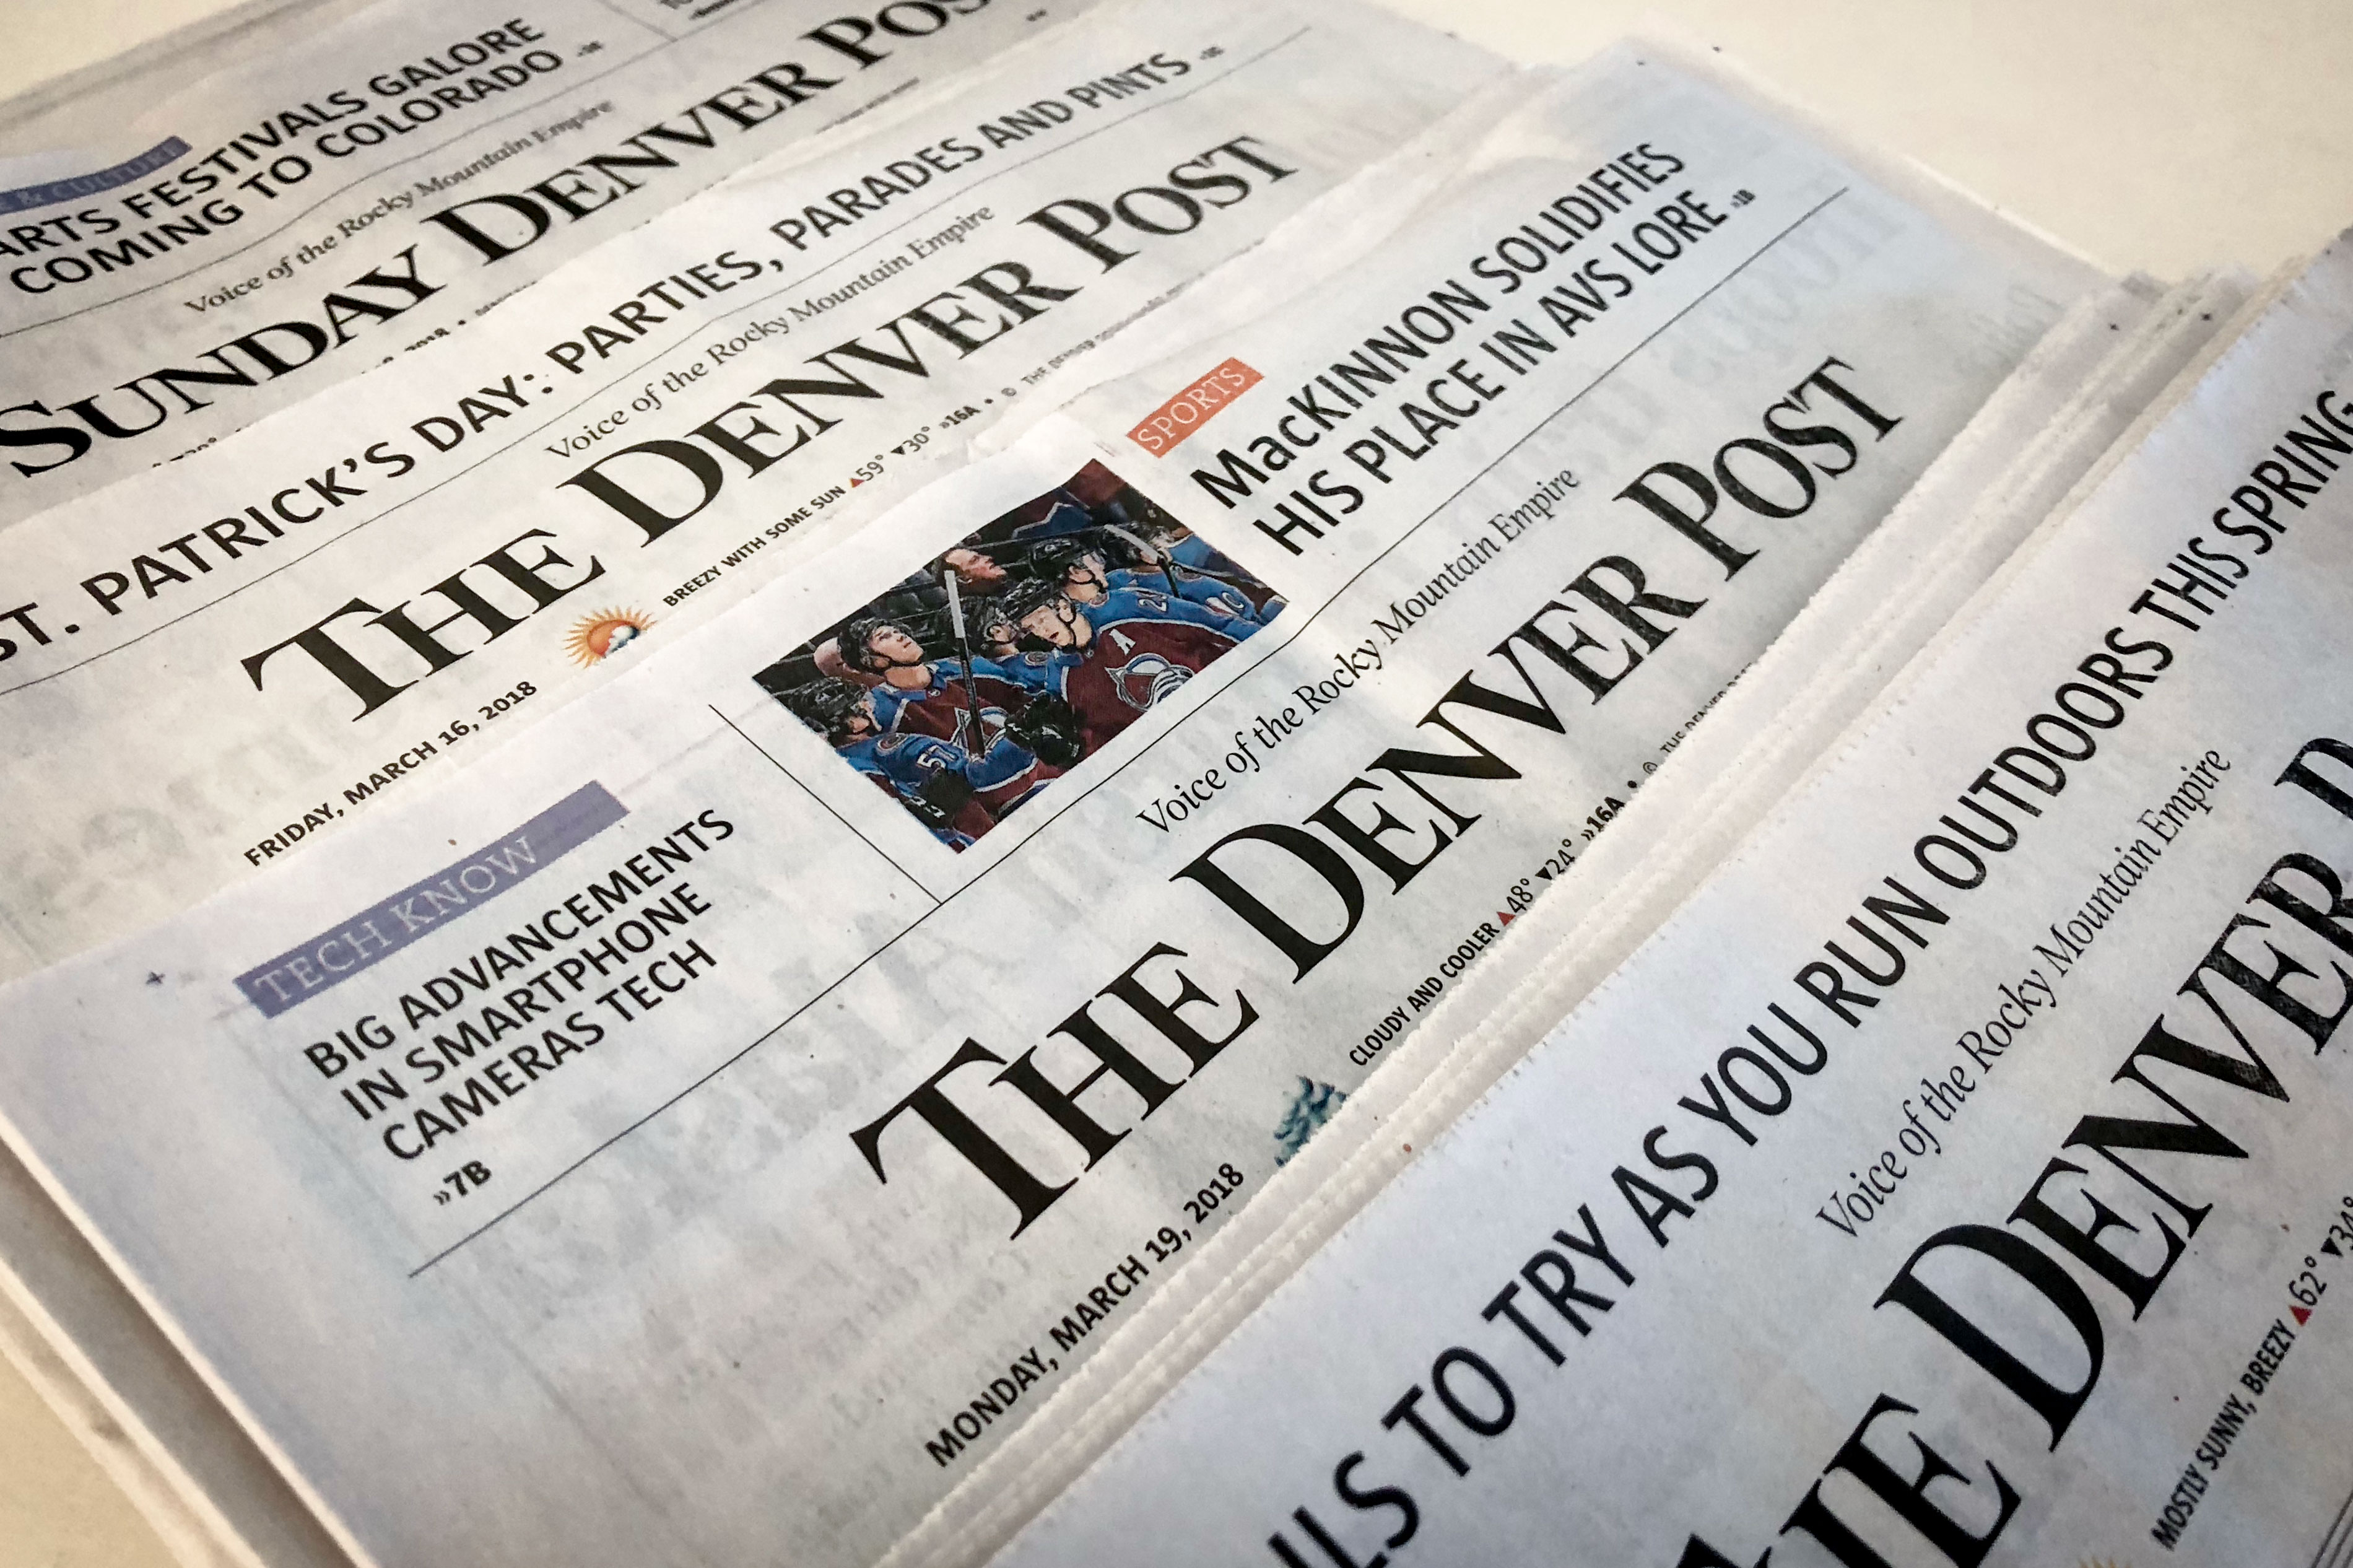 Photo: Denver Post Masthead Collage - JHill